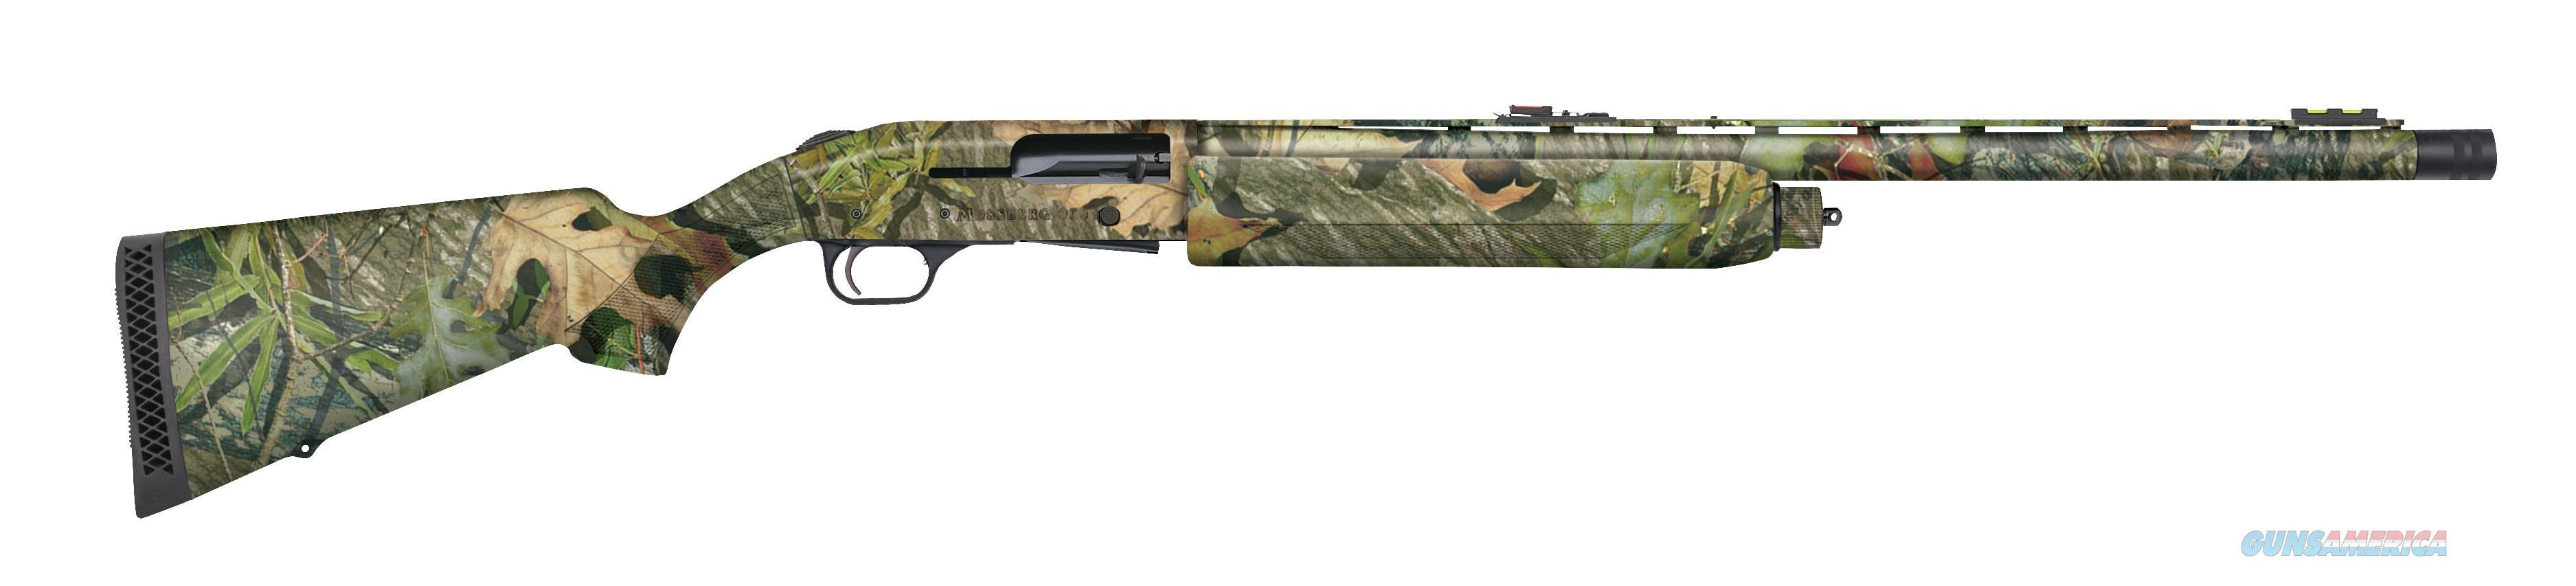 "Mossberg 930 Turkey 12 Gauge 24"" 5 Rounds MOOB 85222   Guns > Shotguns > Mossberg Shotguns > Autoloaders"